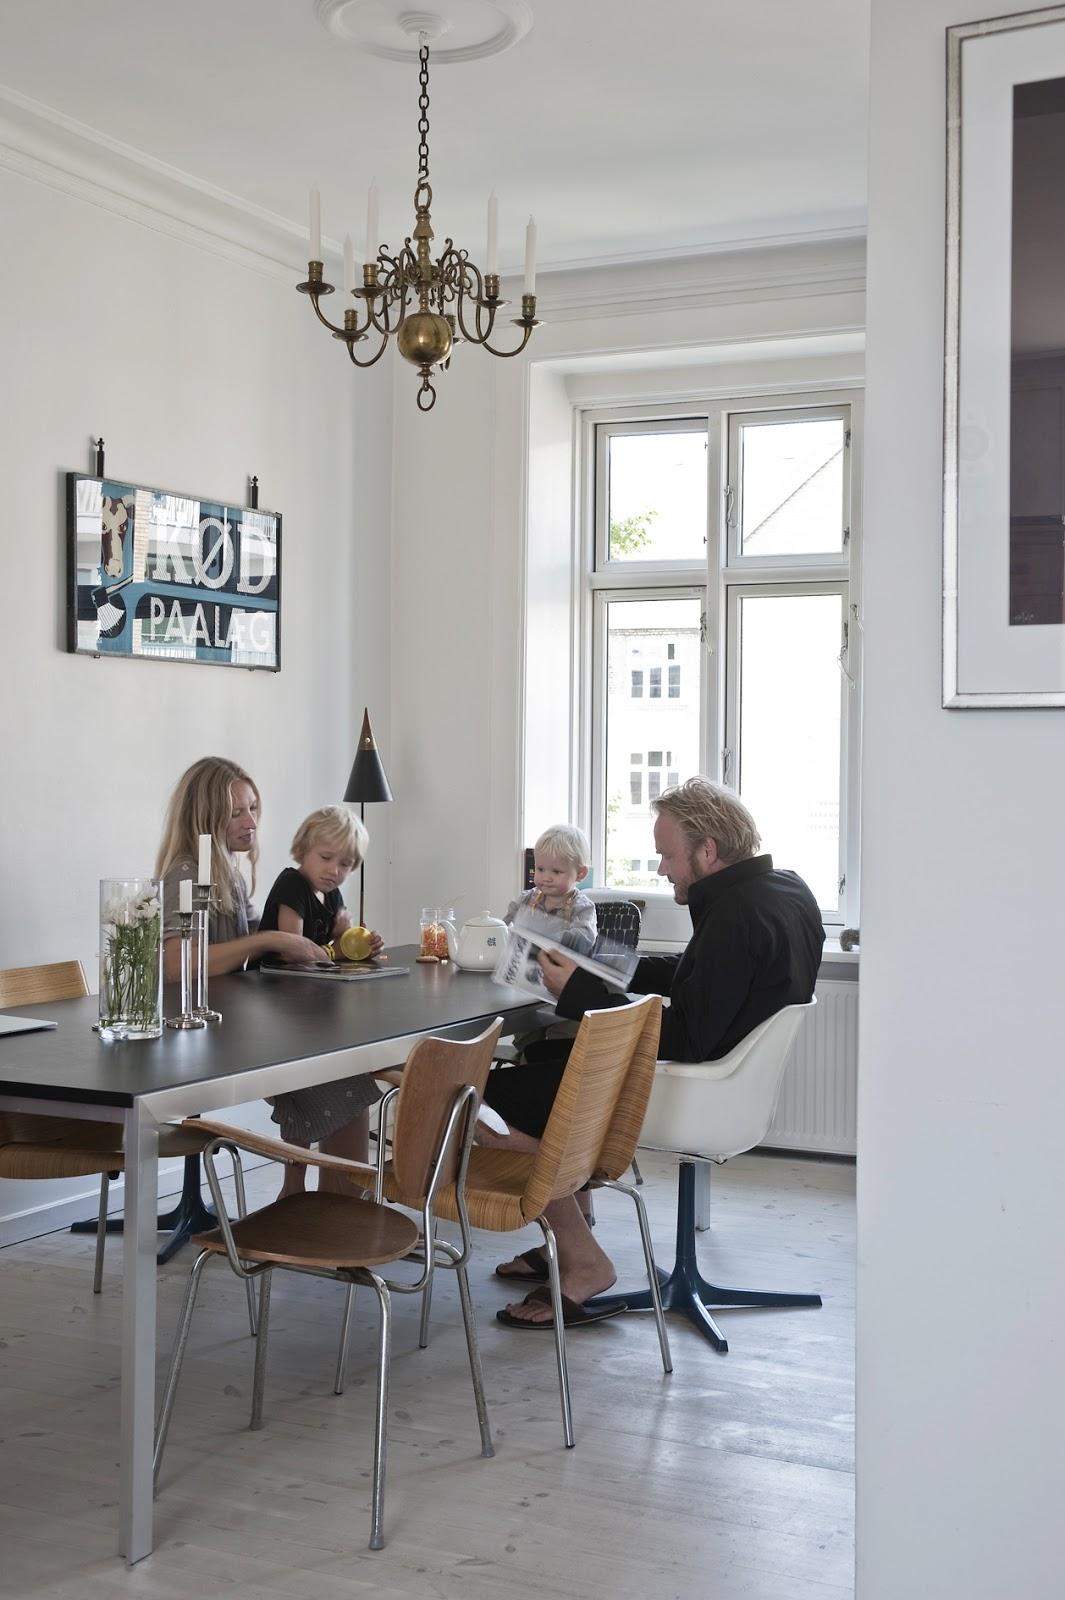 Photo reportage chez Trine et Rene || Camilla Tange